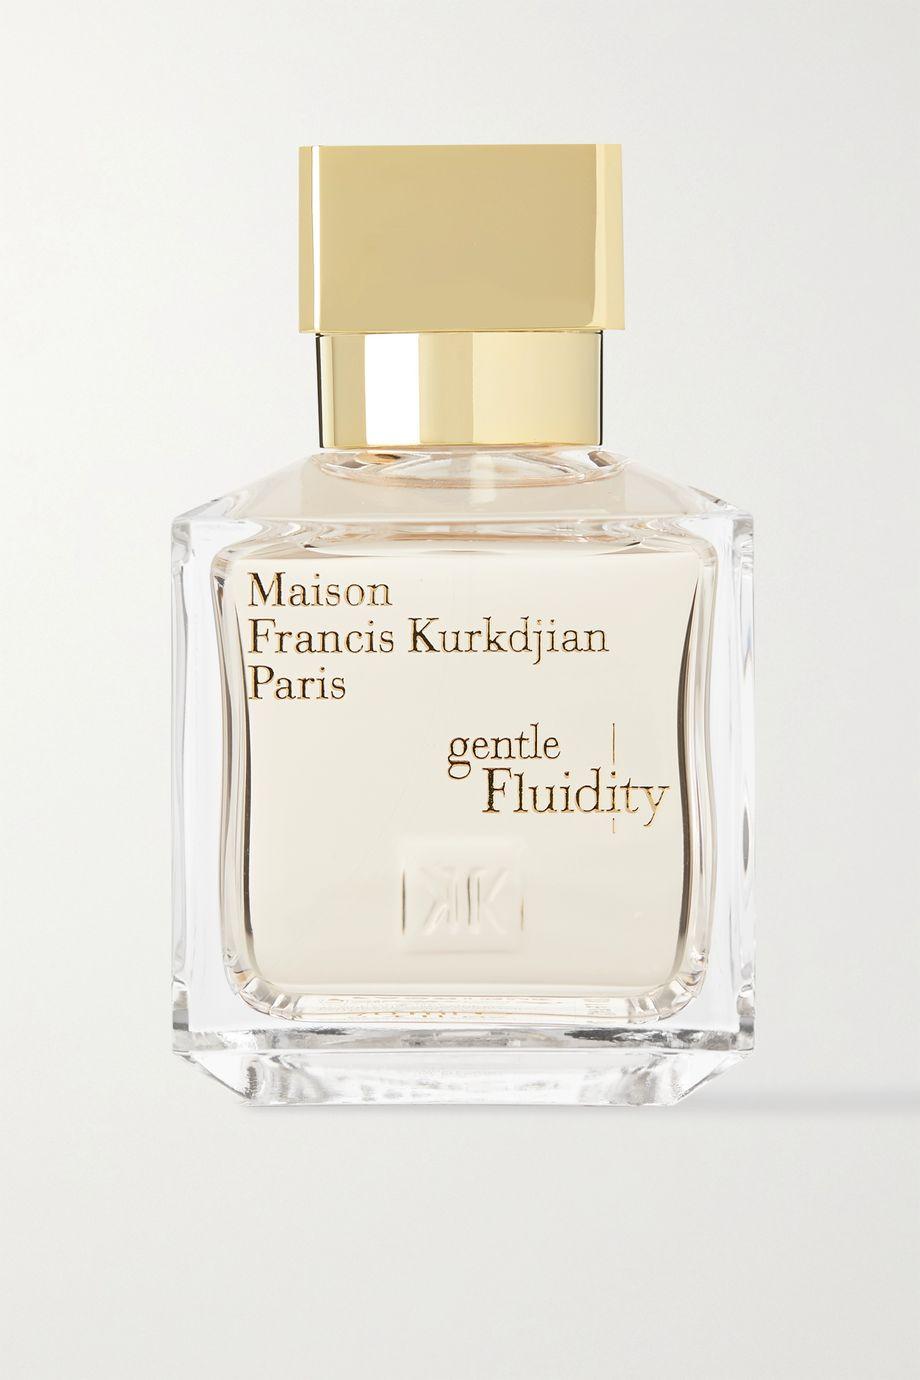 Maison Francis Kurkdjian Gentle Fluidity Gold Edition, 70 ml – Eau de Parfum